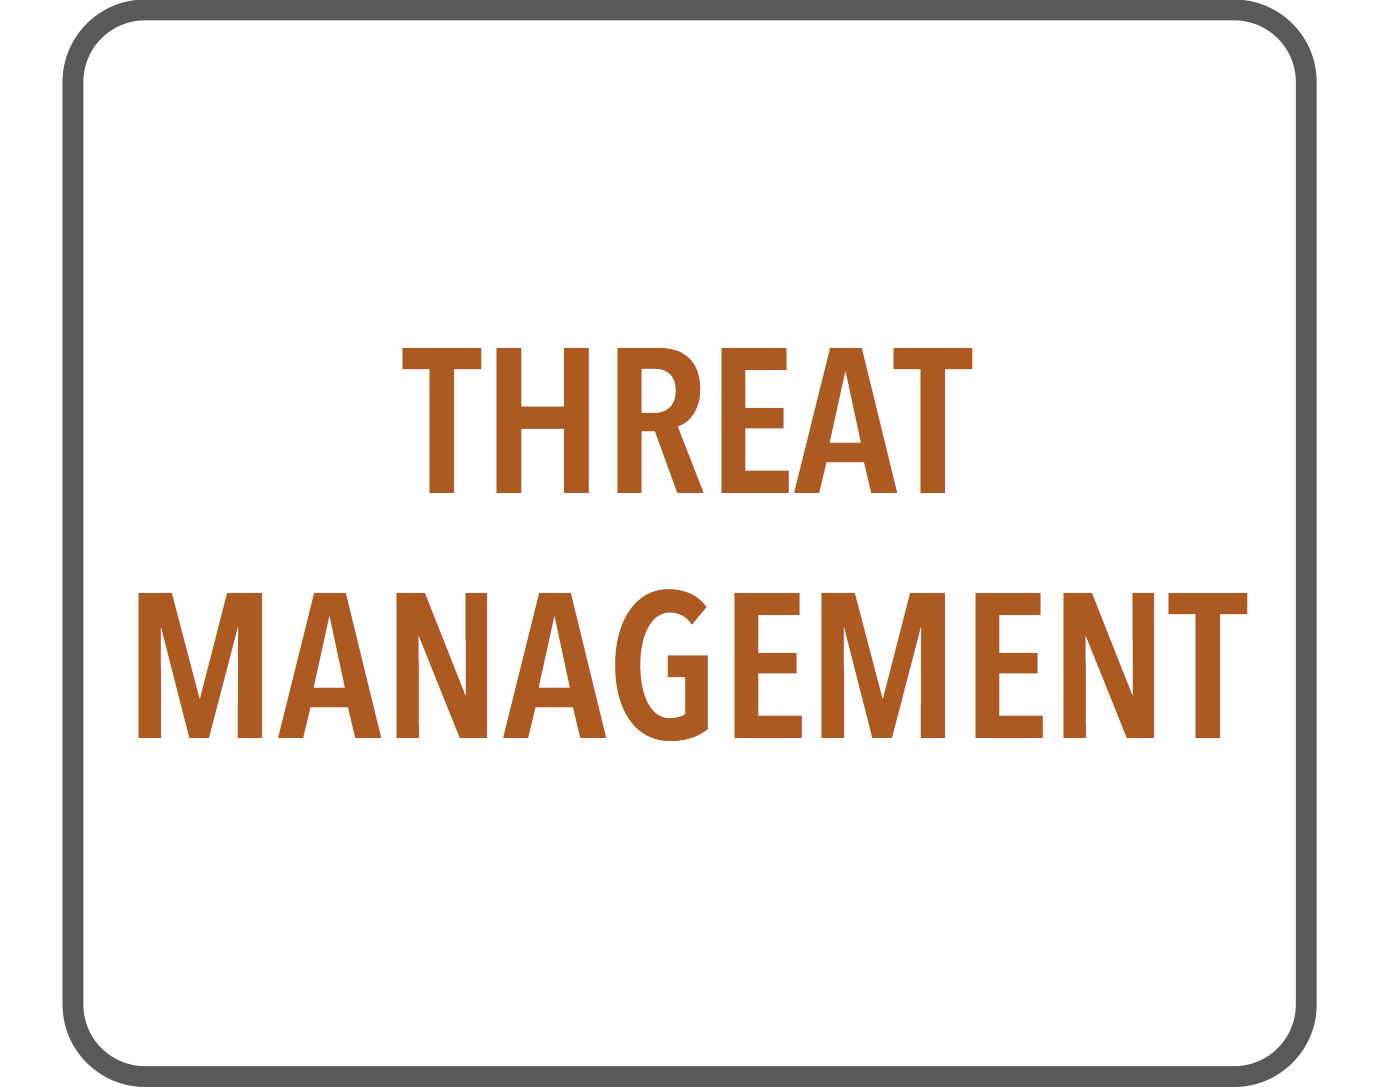 Threat mgmt.jpg